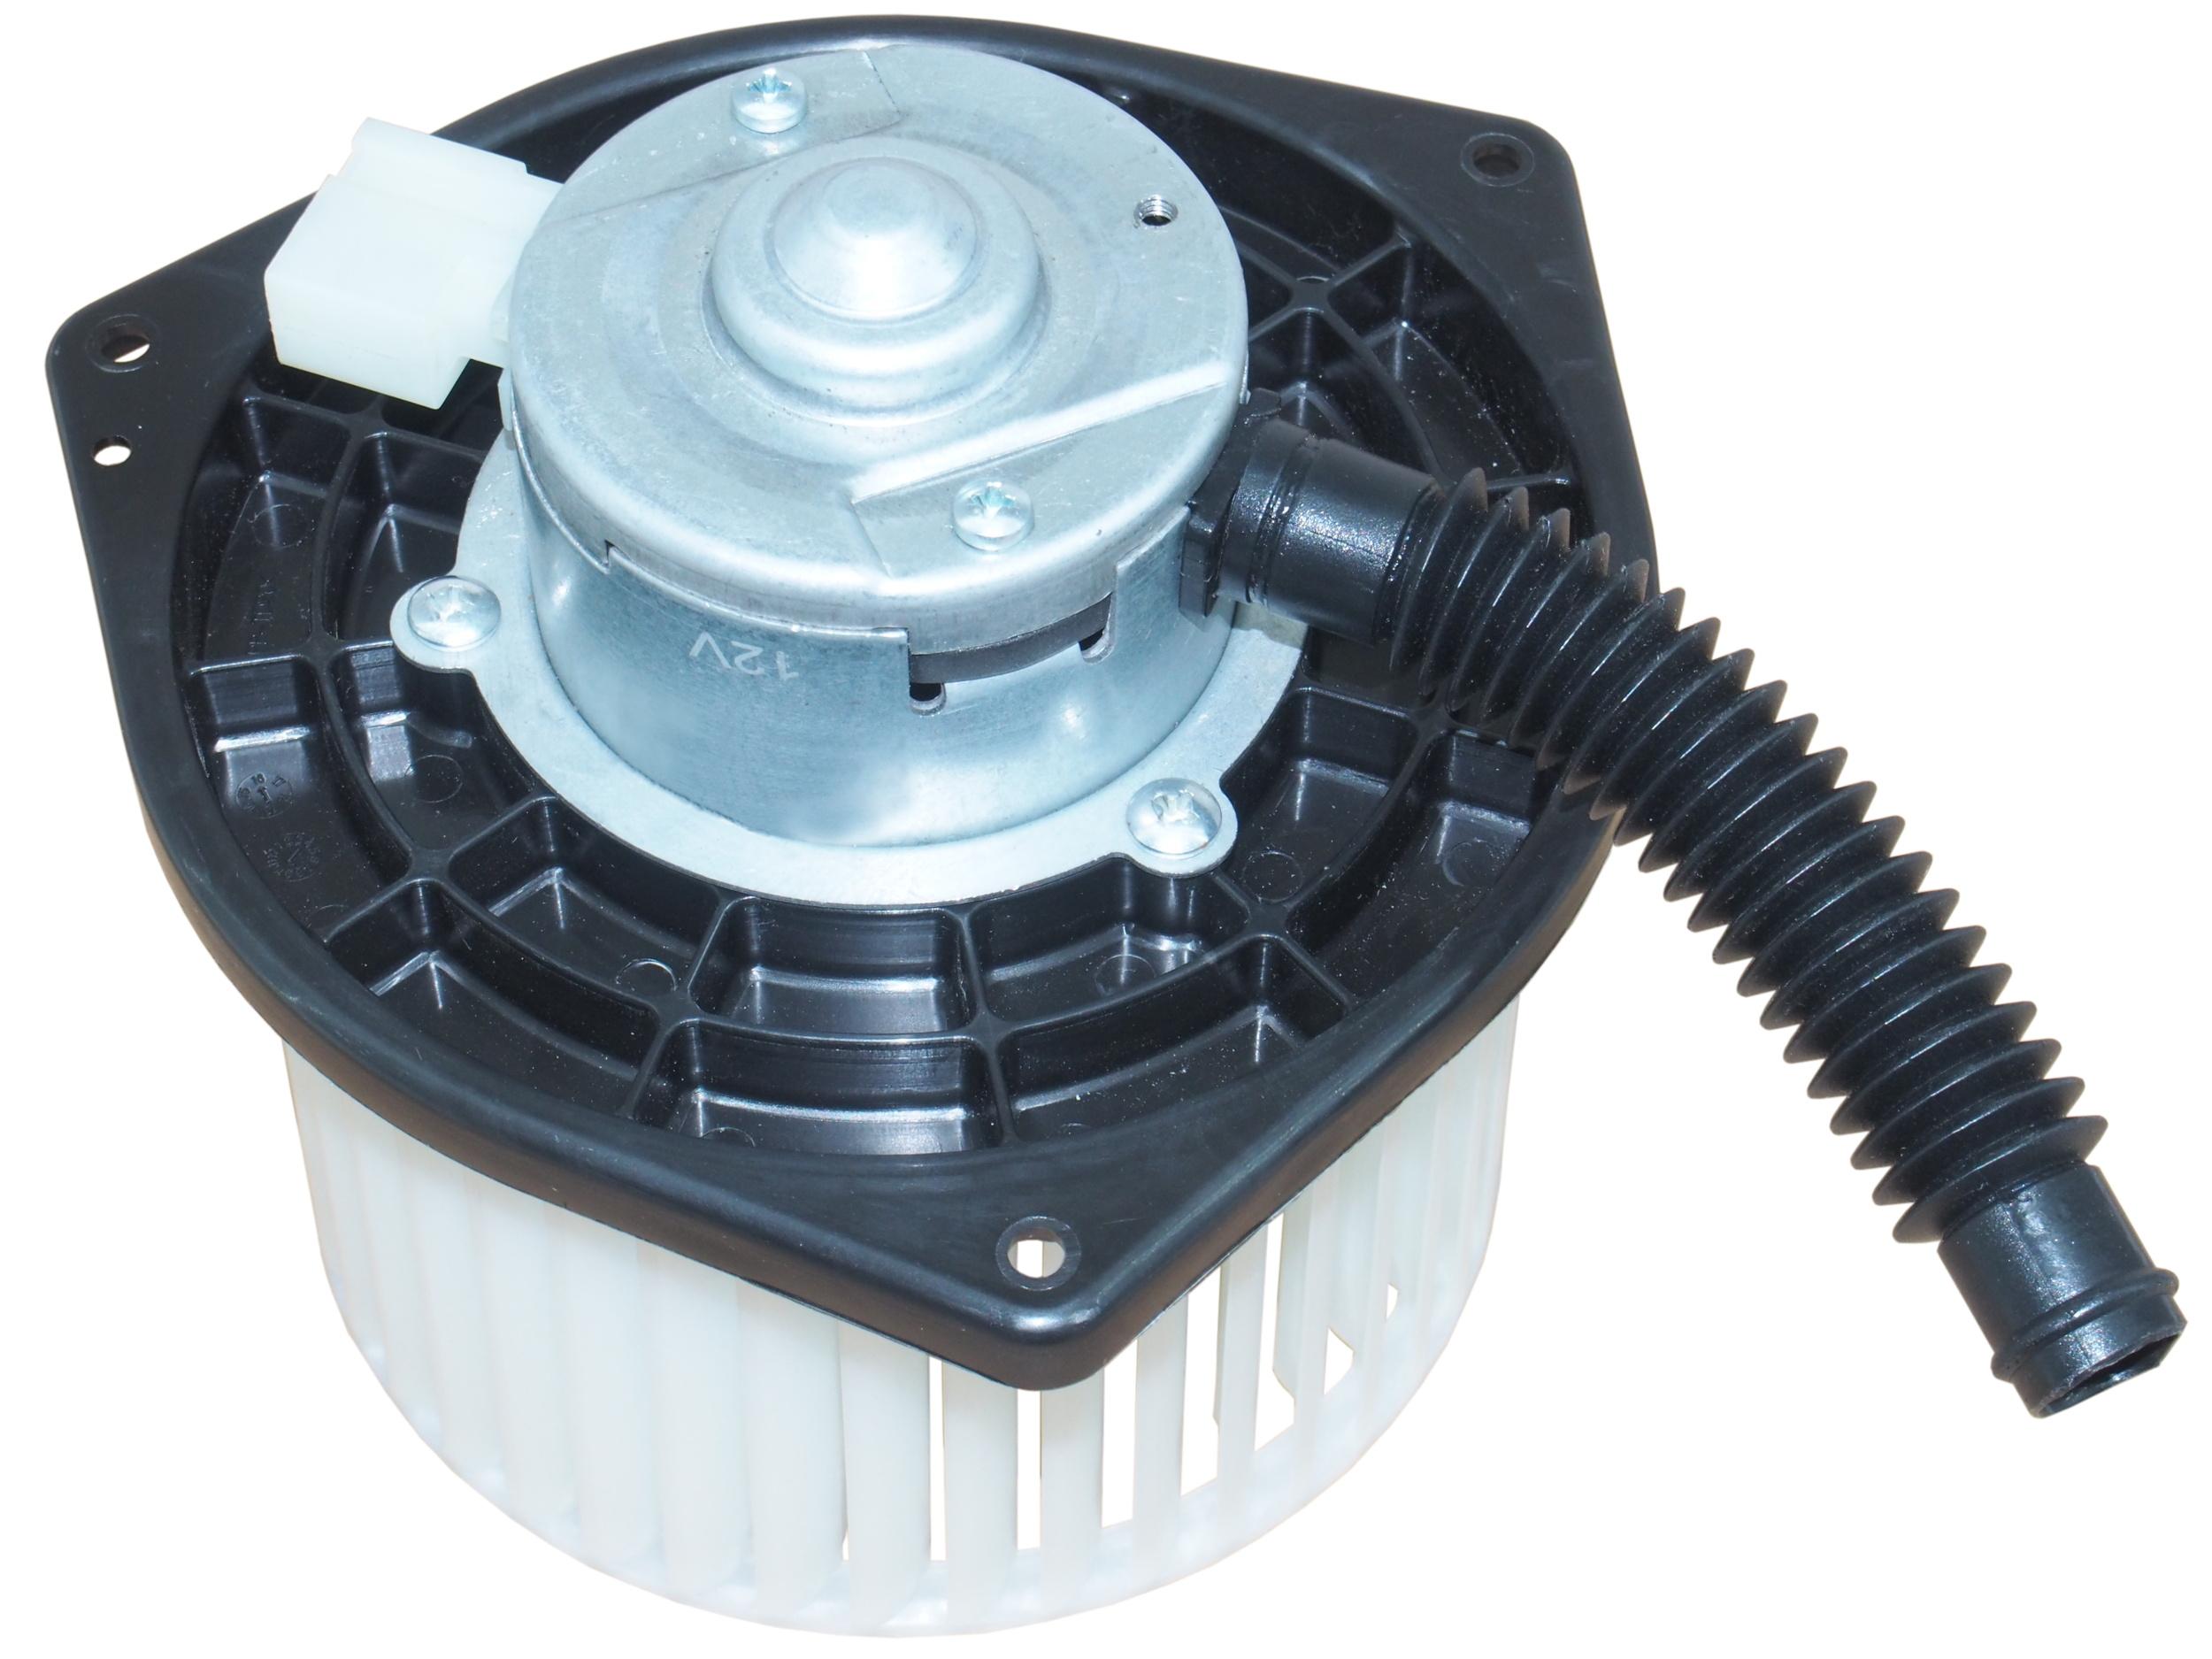 вентилятор вентилятор suzuki grand vitara 2005-